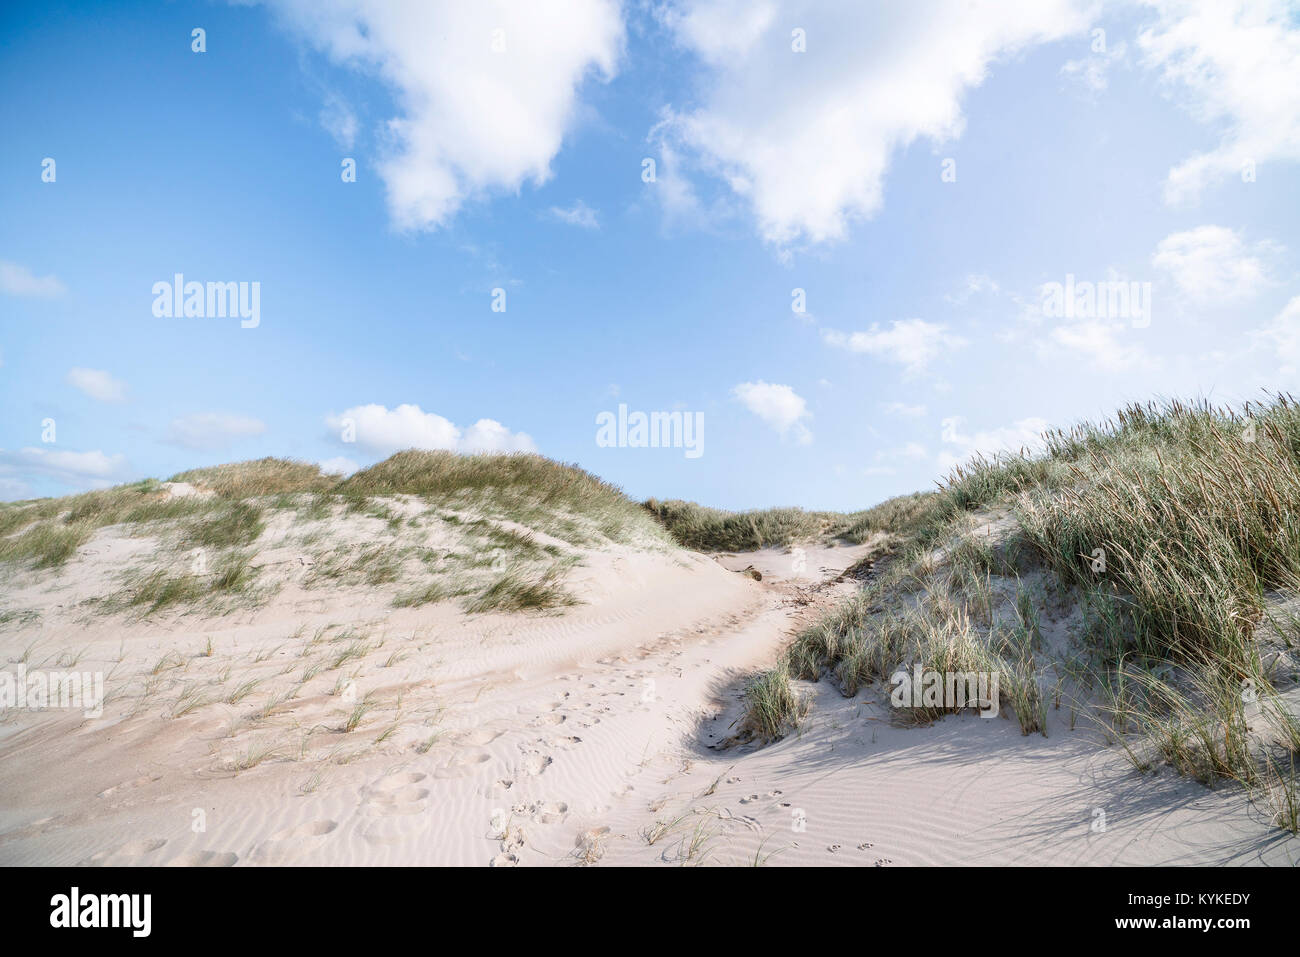 Beach dunes on a Scandinavian beach in the summer with lyme grass under a blue sky - Stock Image